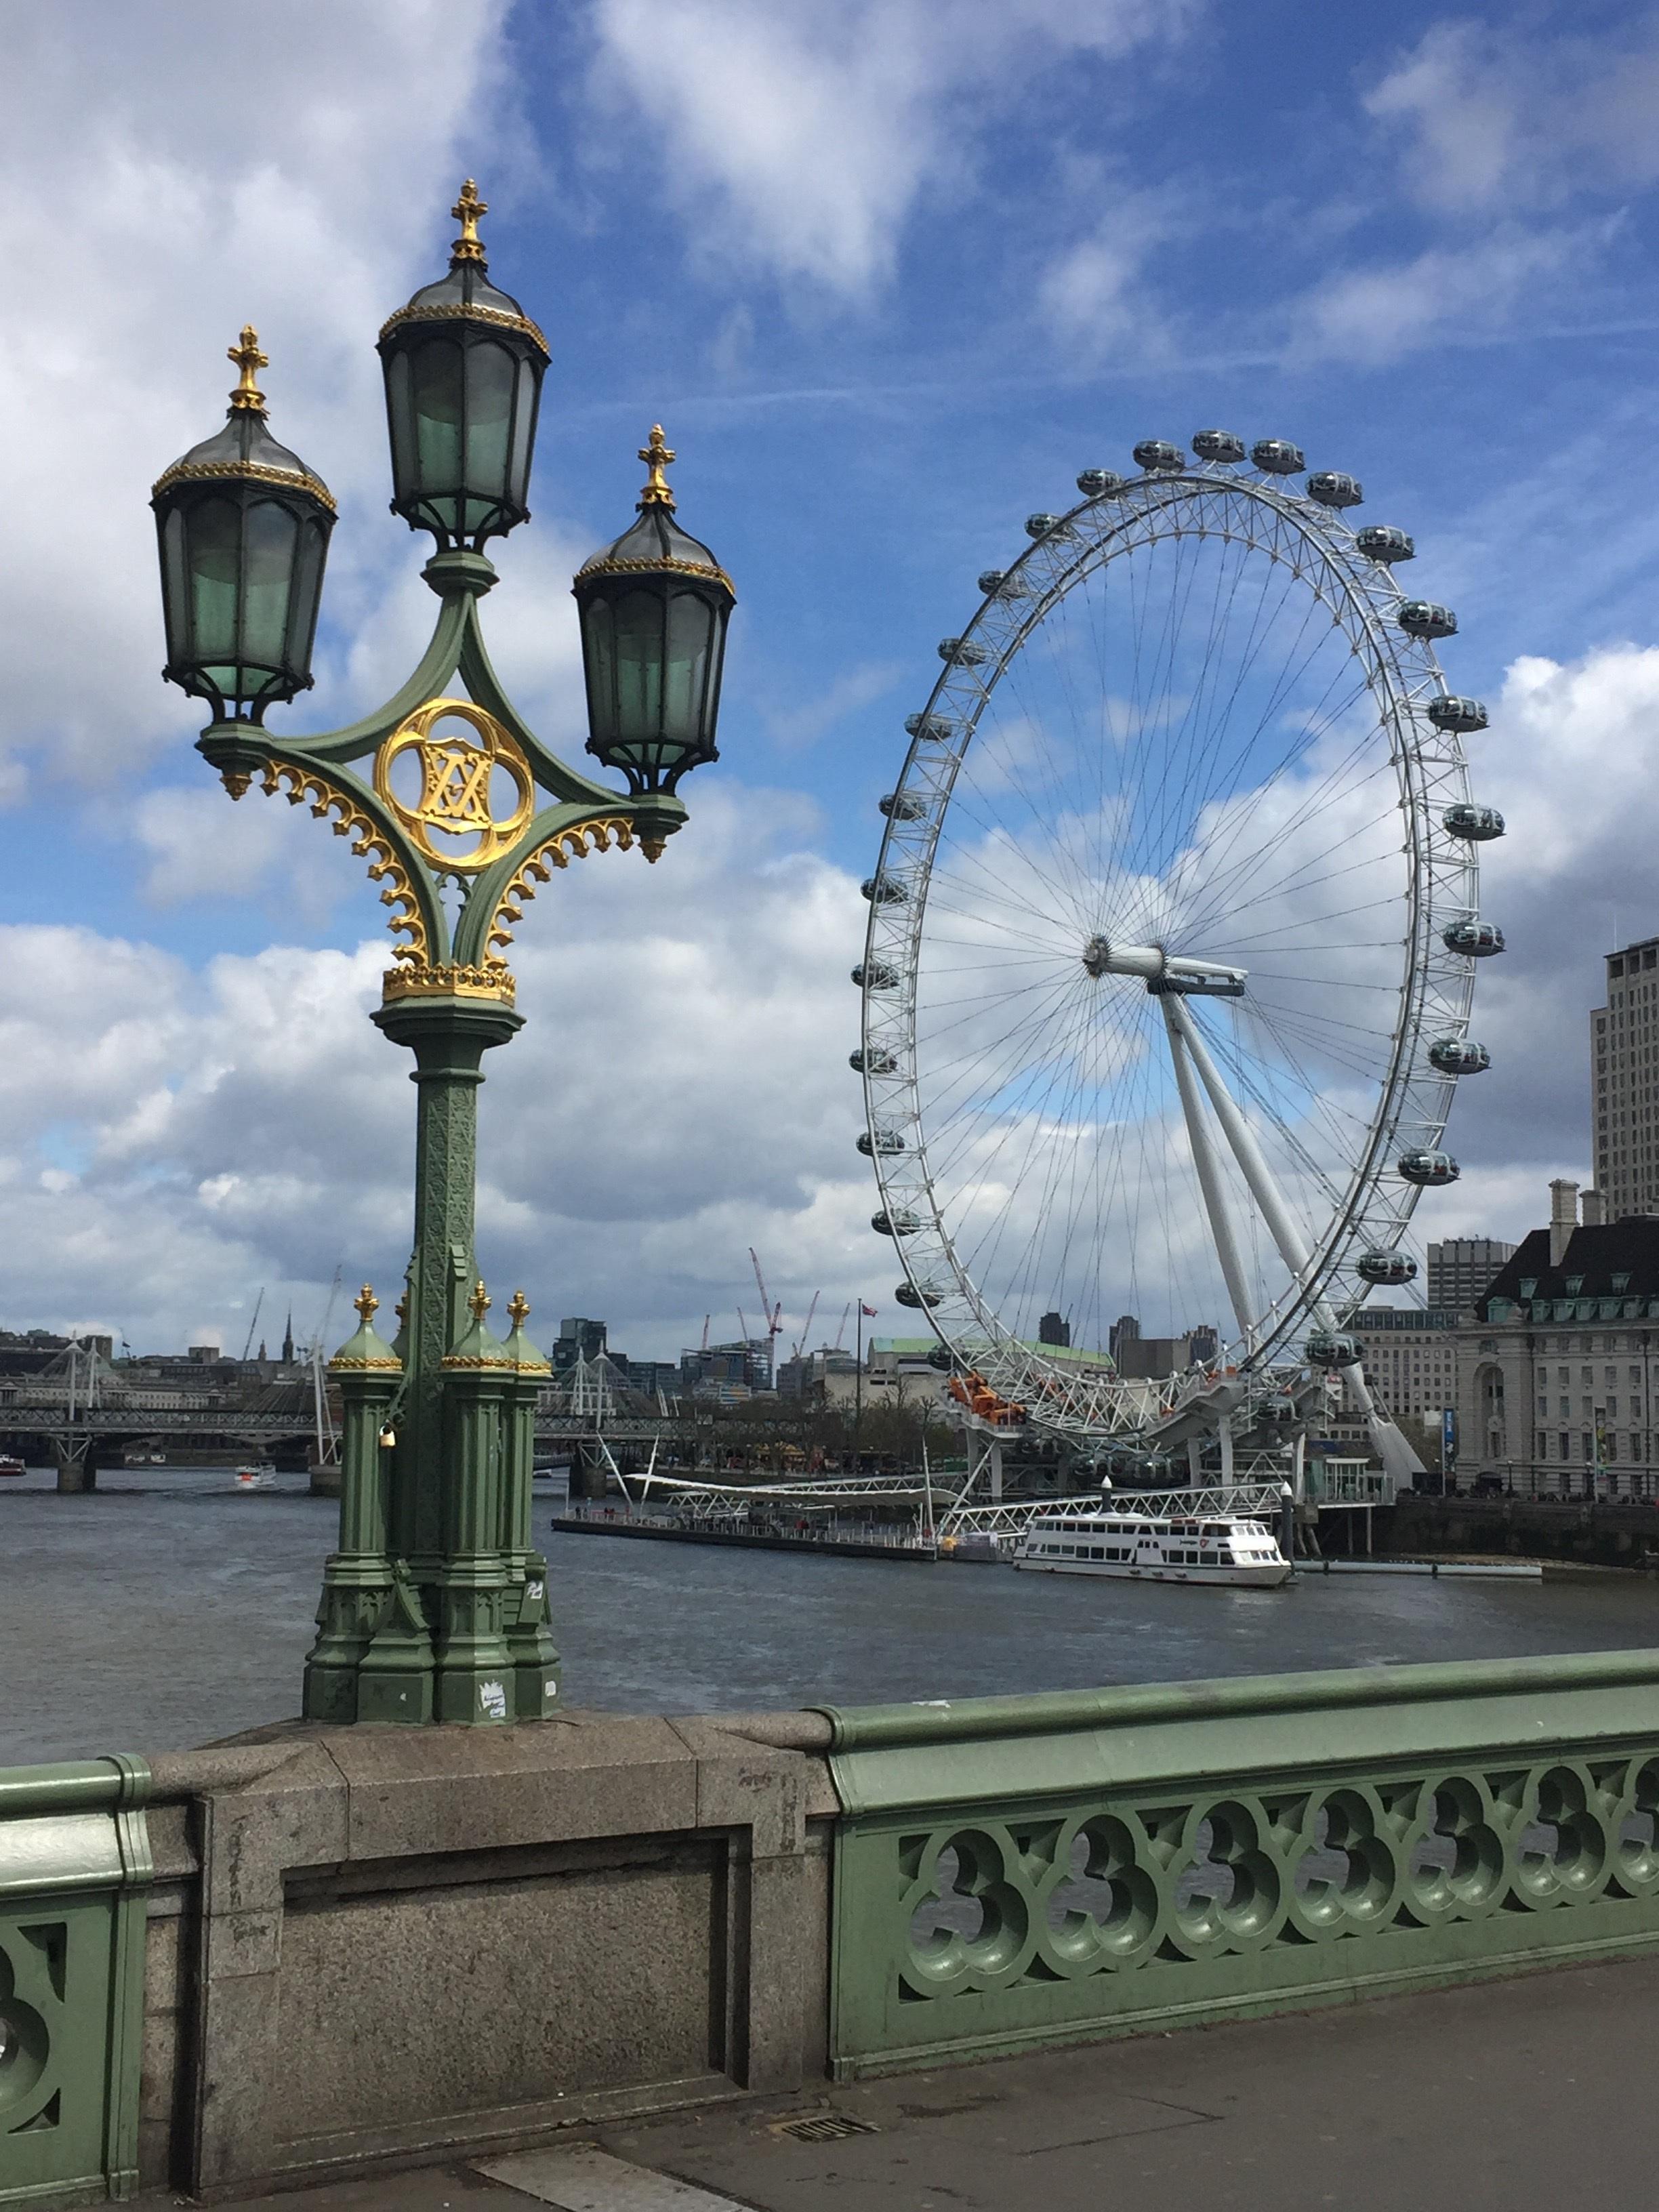 Kostenlose Foto Wolke Riesenrad Freizeitpark Turm Park London